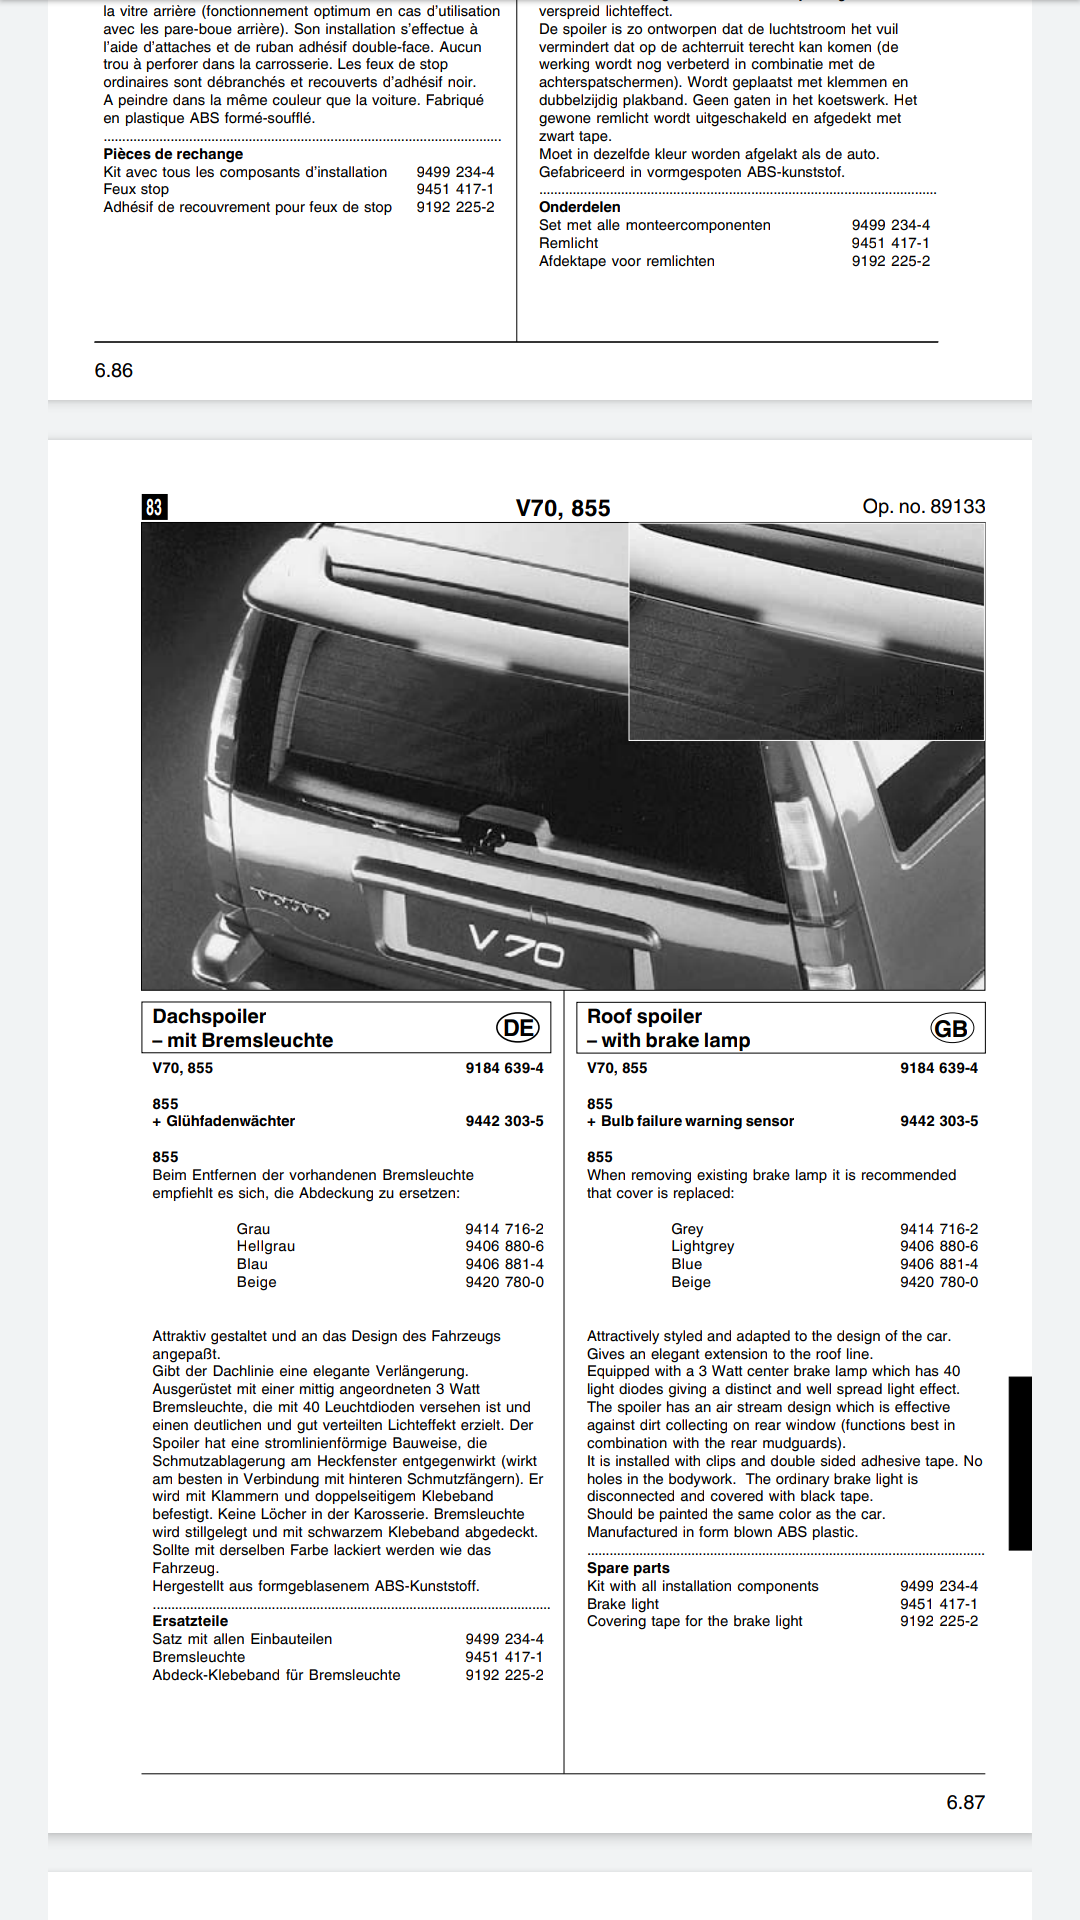 Screenshot_2020-02-11-17-29-45-92.png